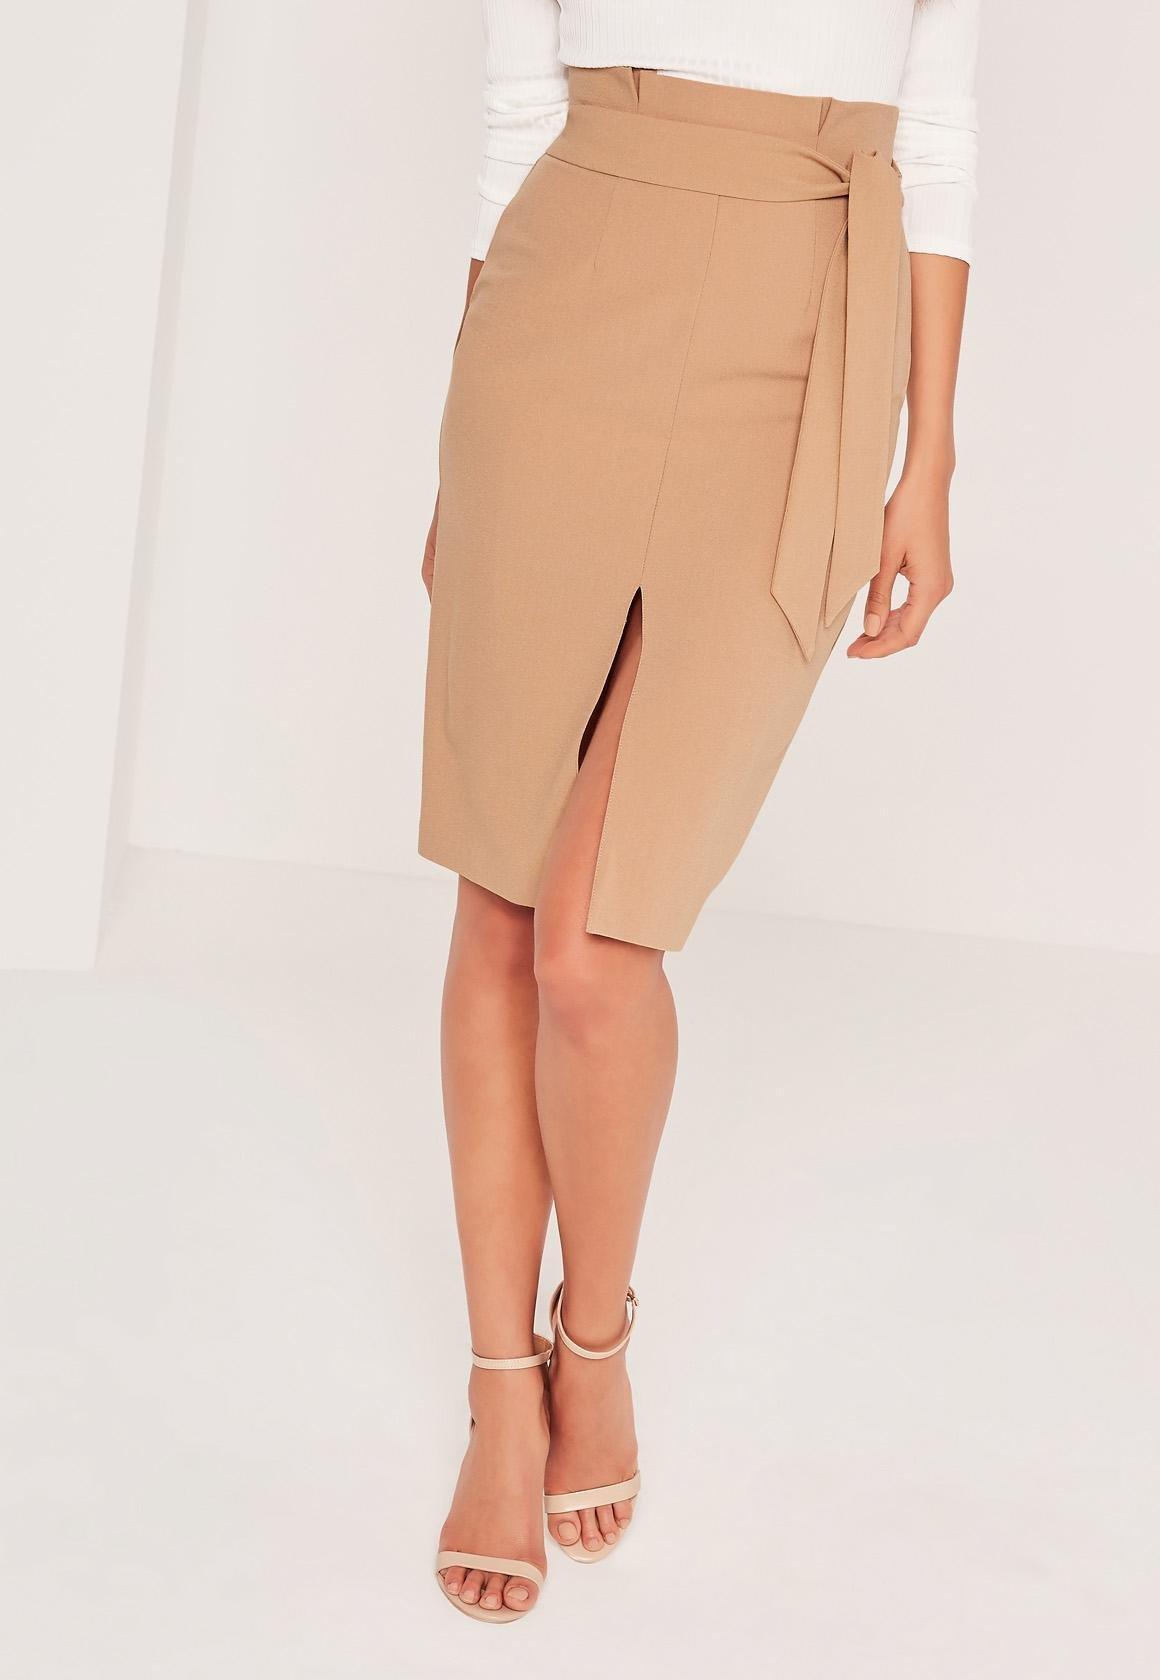 Missguided Paper Bag Waist Pencil Skirt Tan in Blue | Lyst